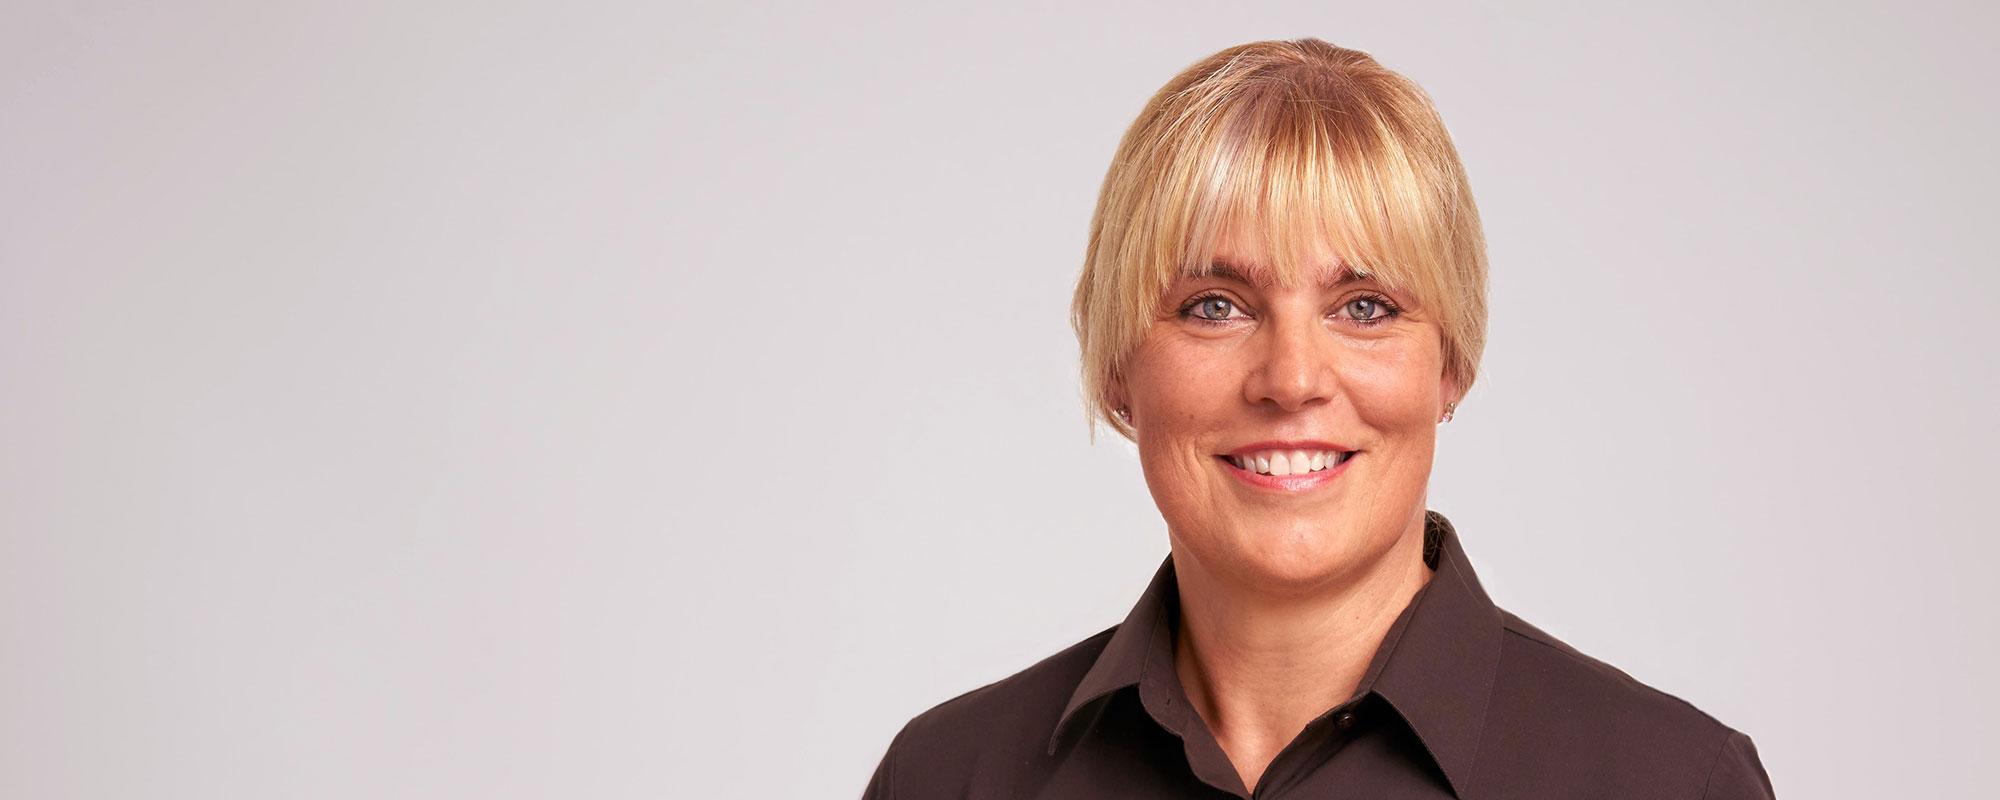 Katrin Gleißle